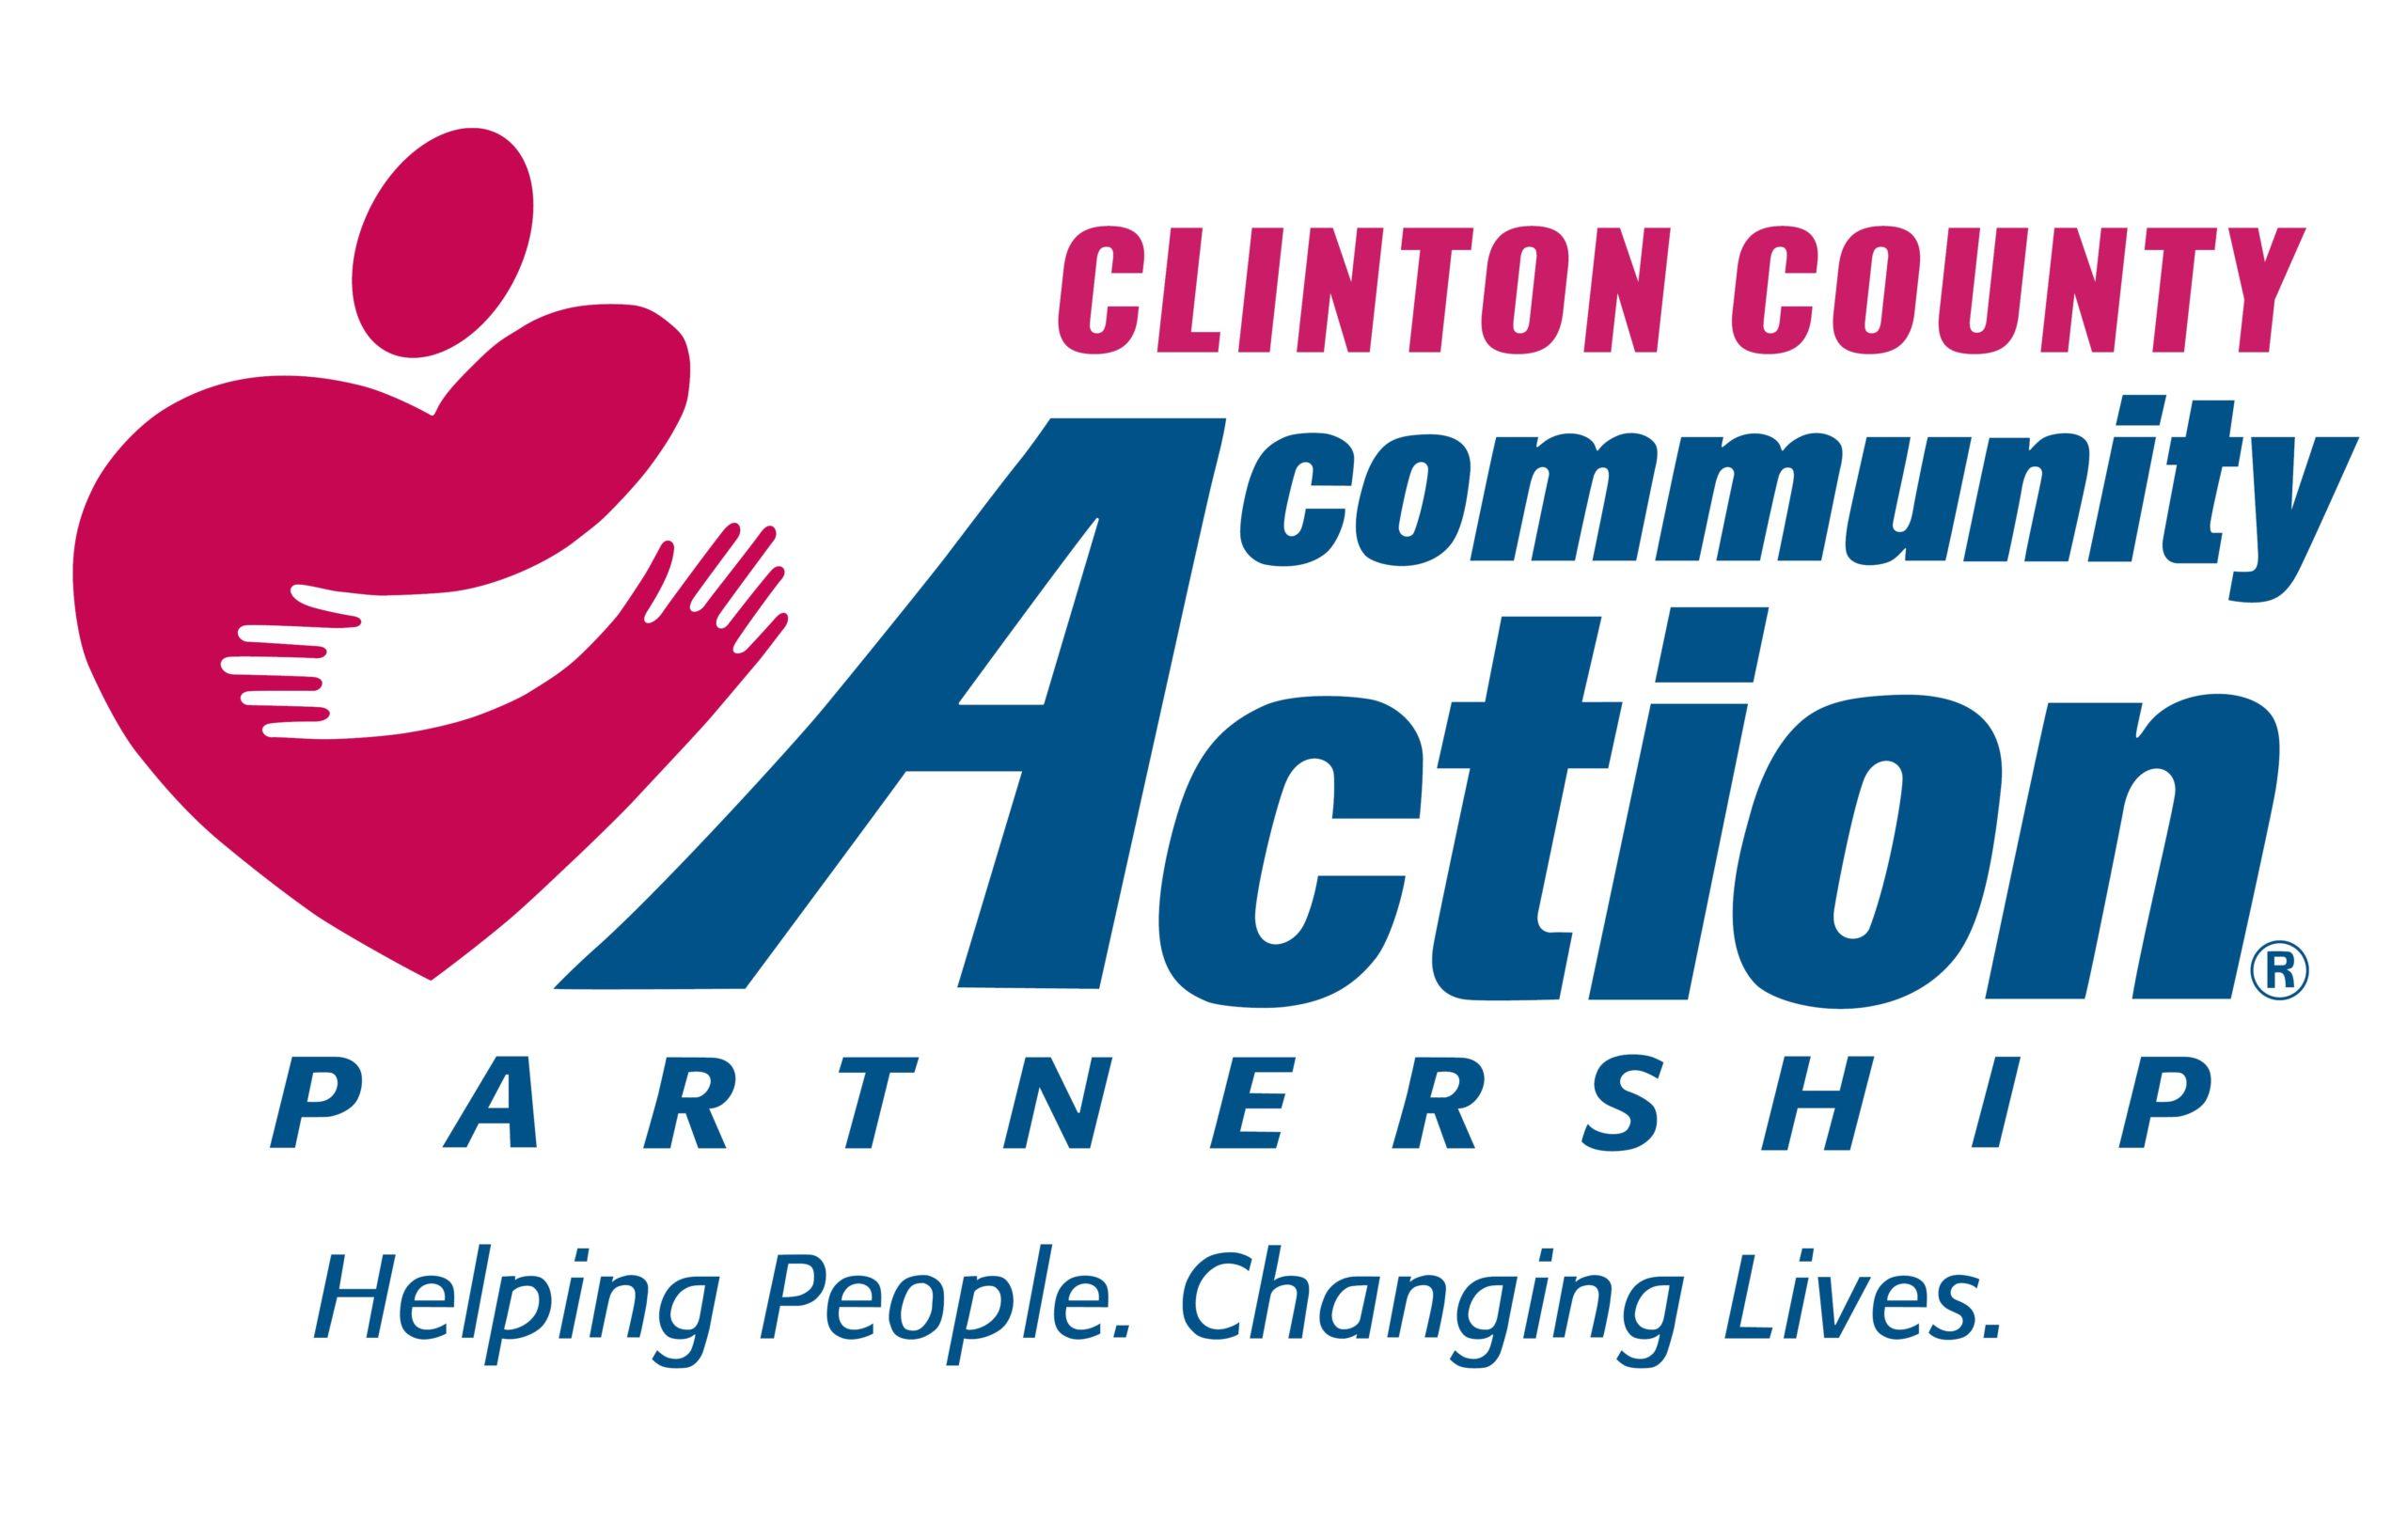 Clinton County Community Action Program, Inc